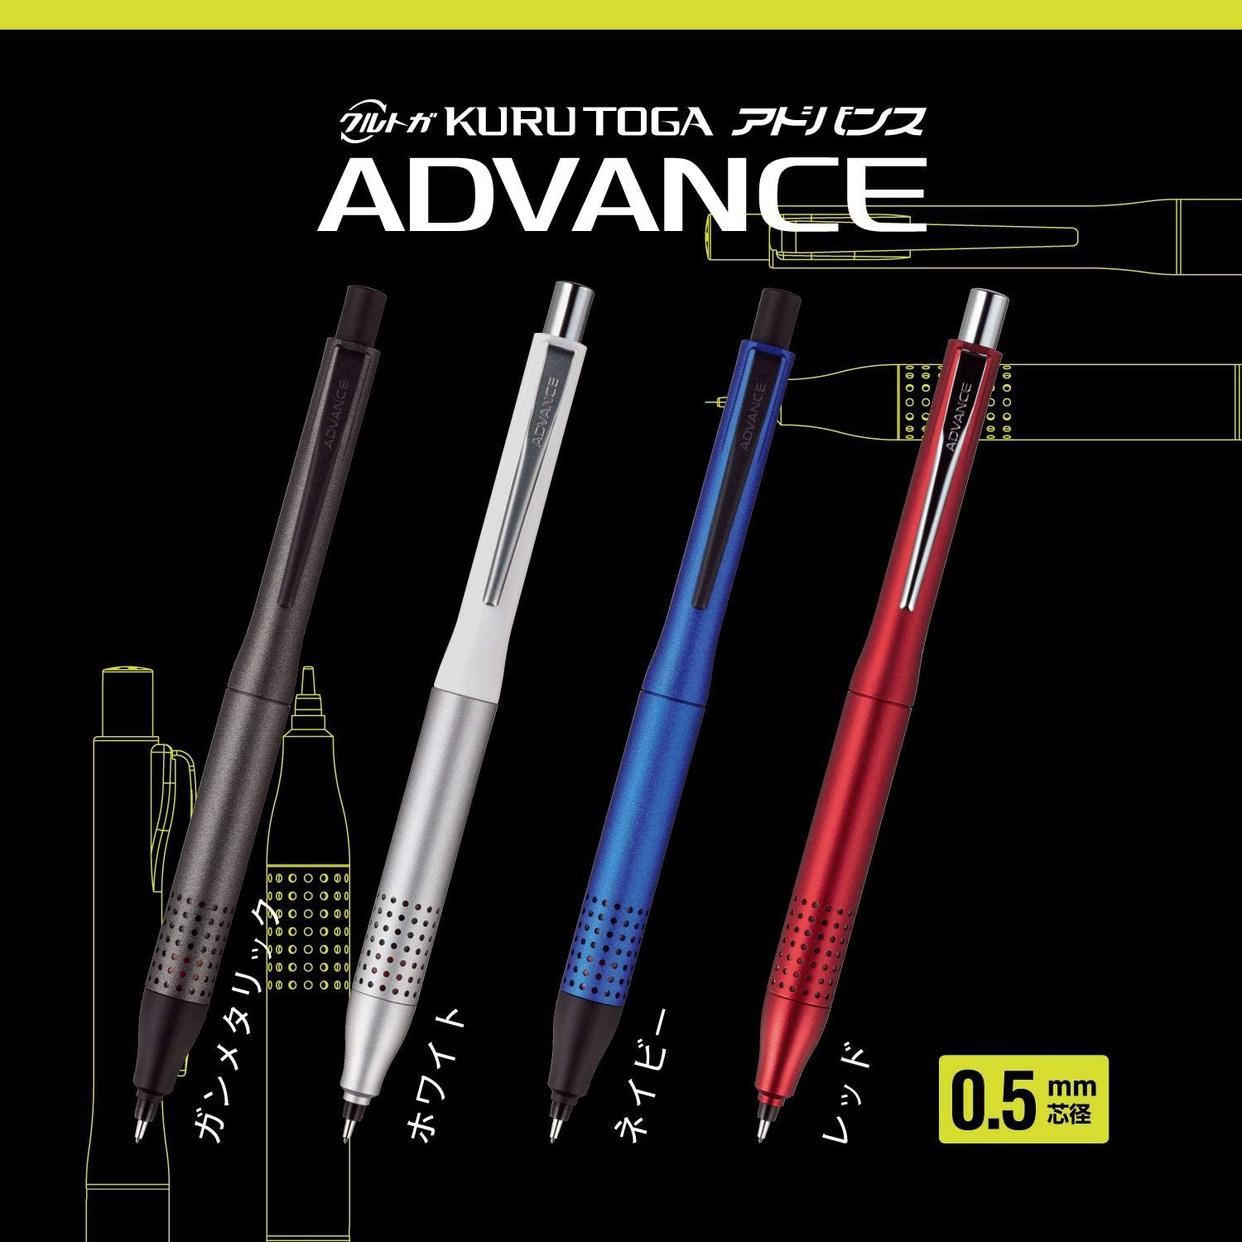 KURU TOGA(クルトガ) アドバンス アップグレードモデル  M5-1030 1Pの商品画像4